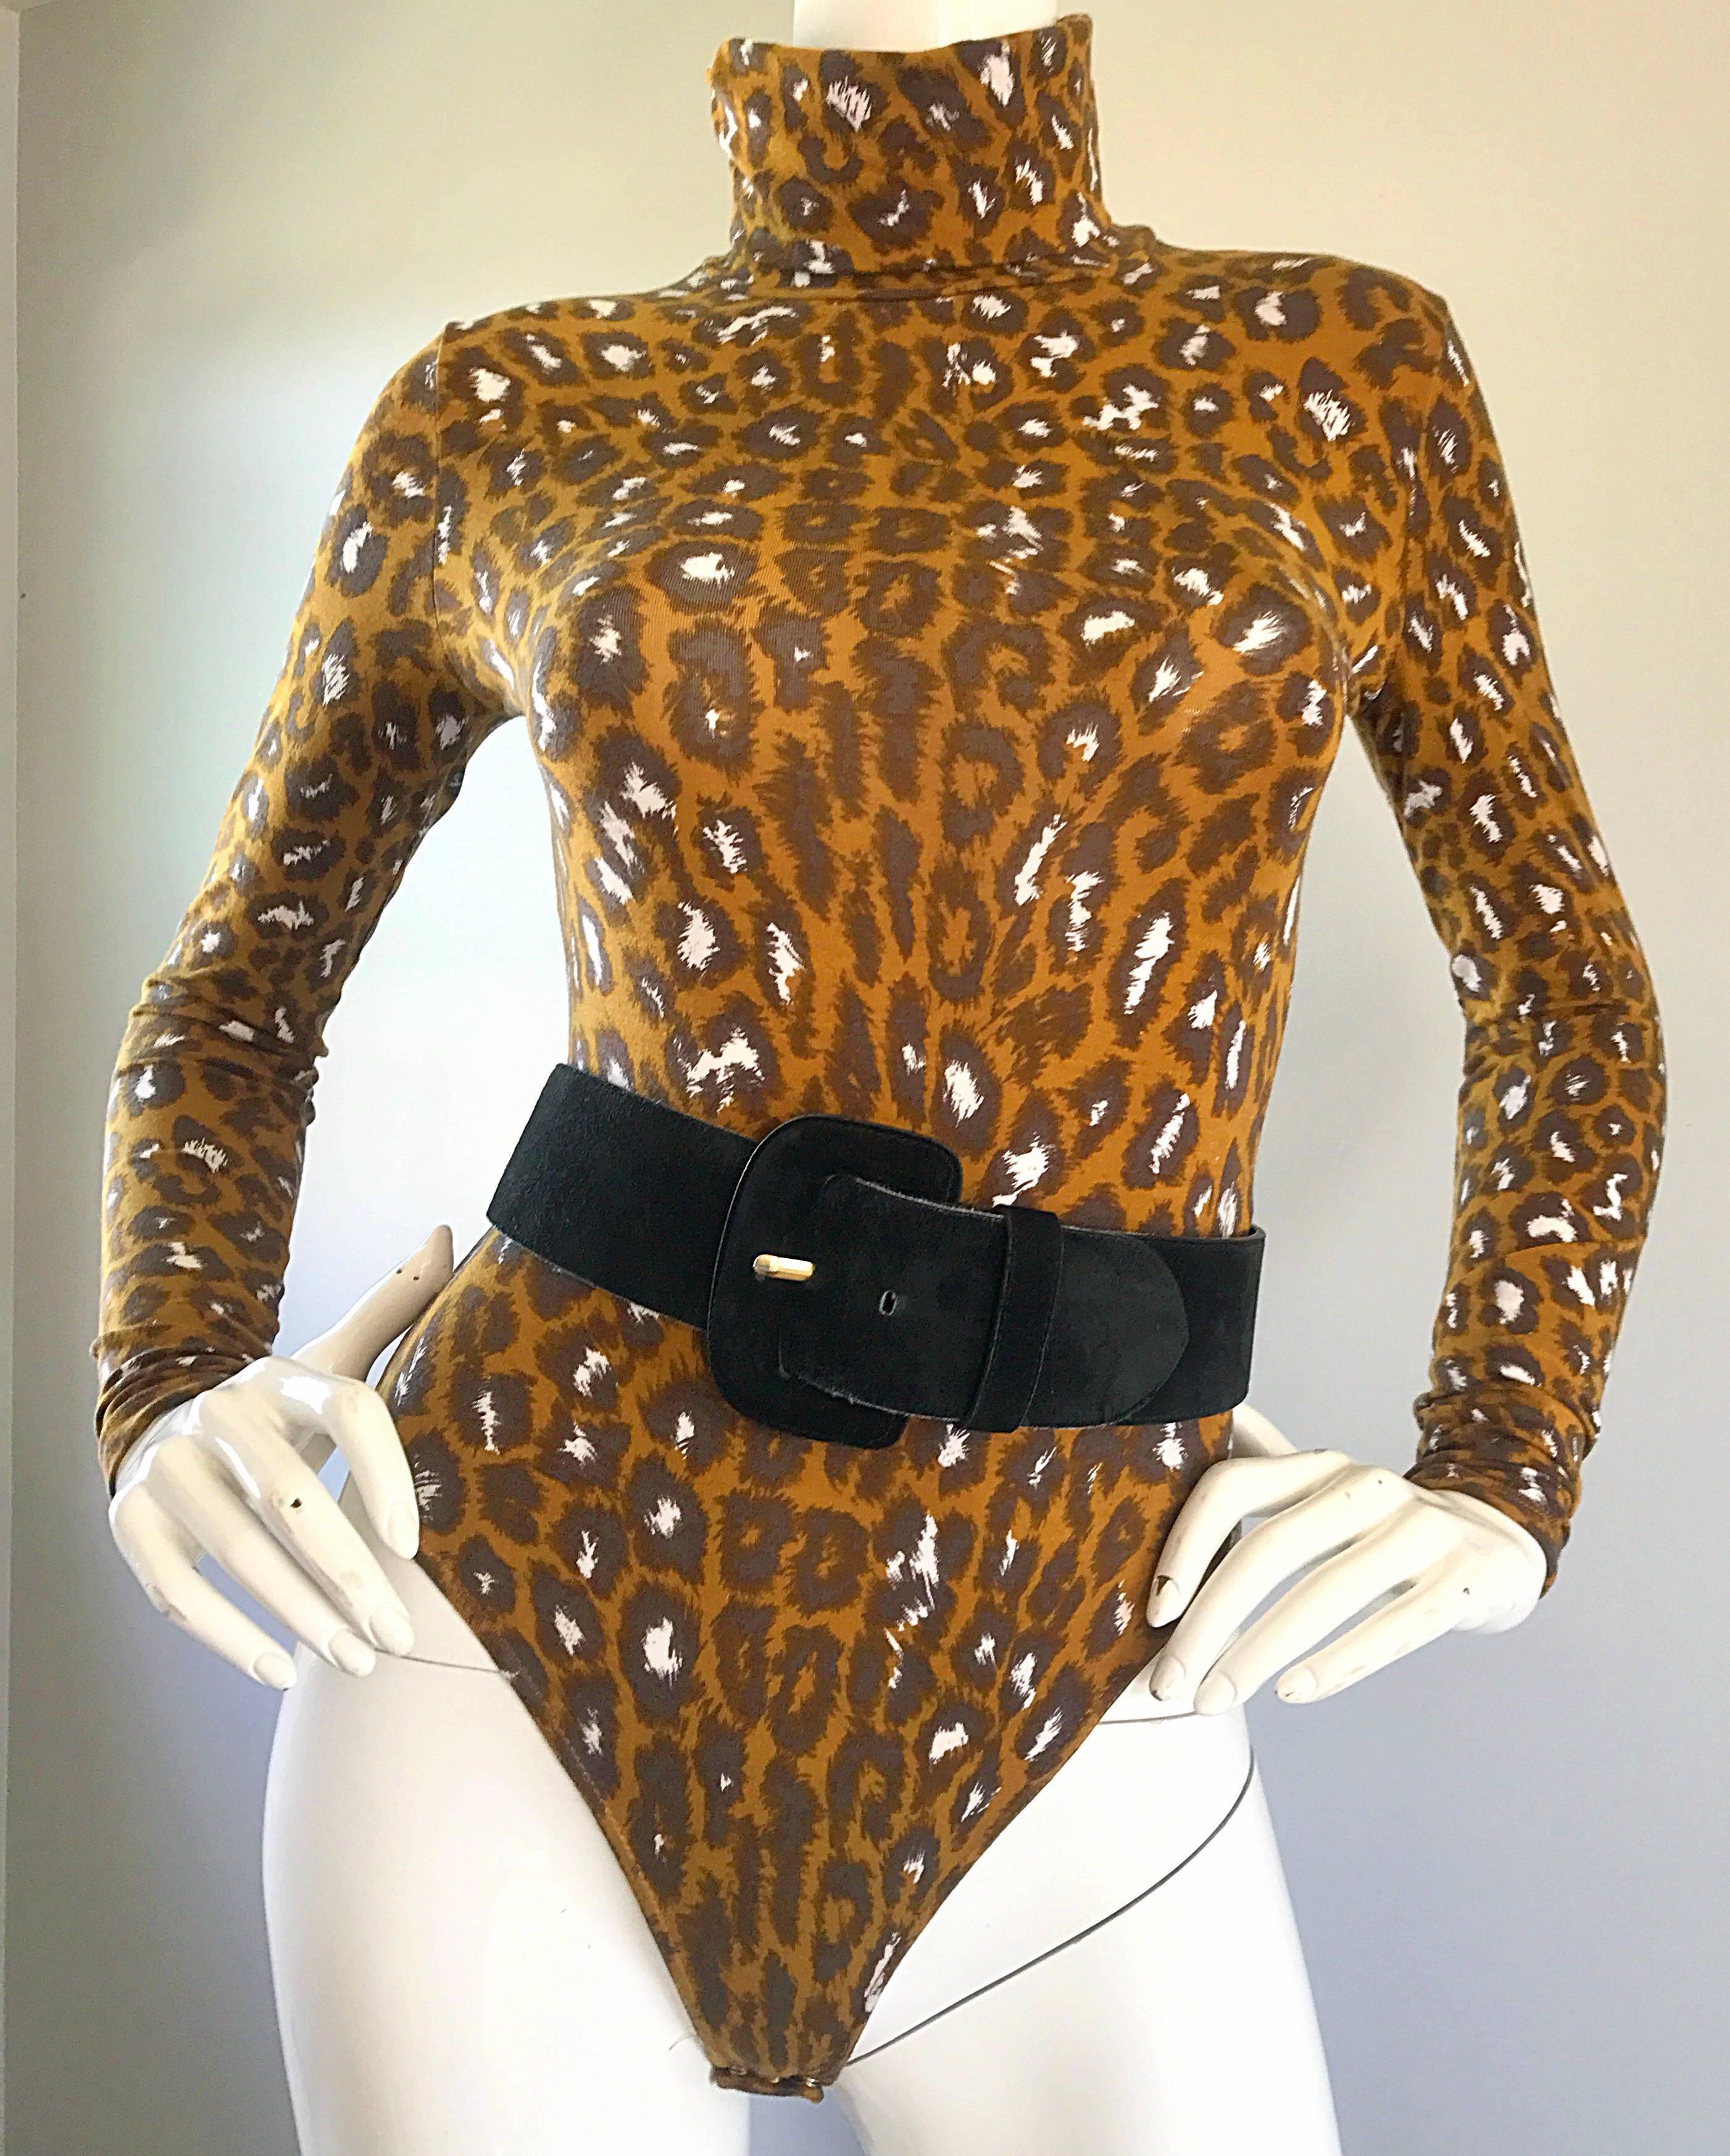 1b471f43332f 1990s Gianni Versace Leopard Print 90s Vintage Turtleneck Bodysuit Unitard  at 1stdibs